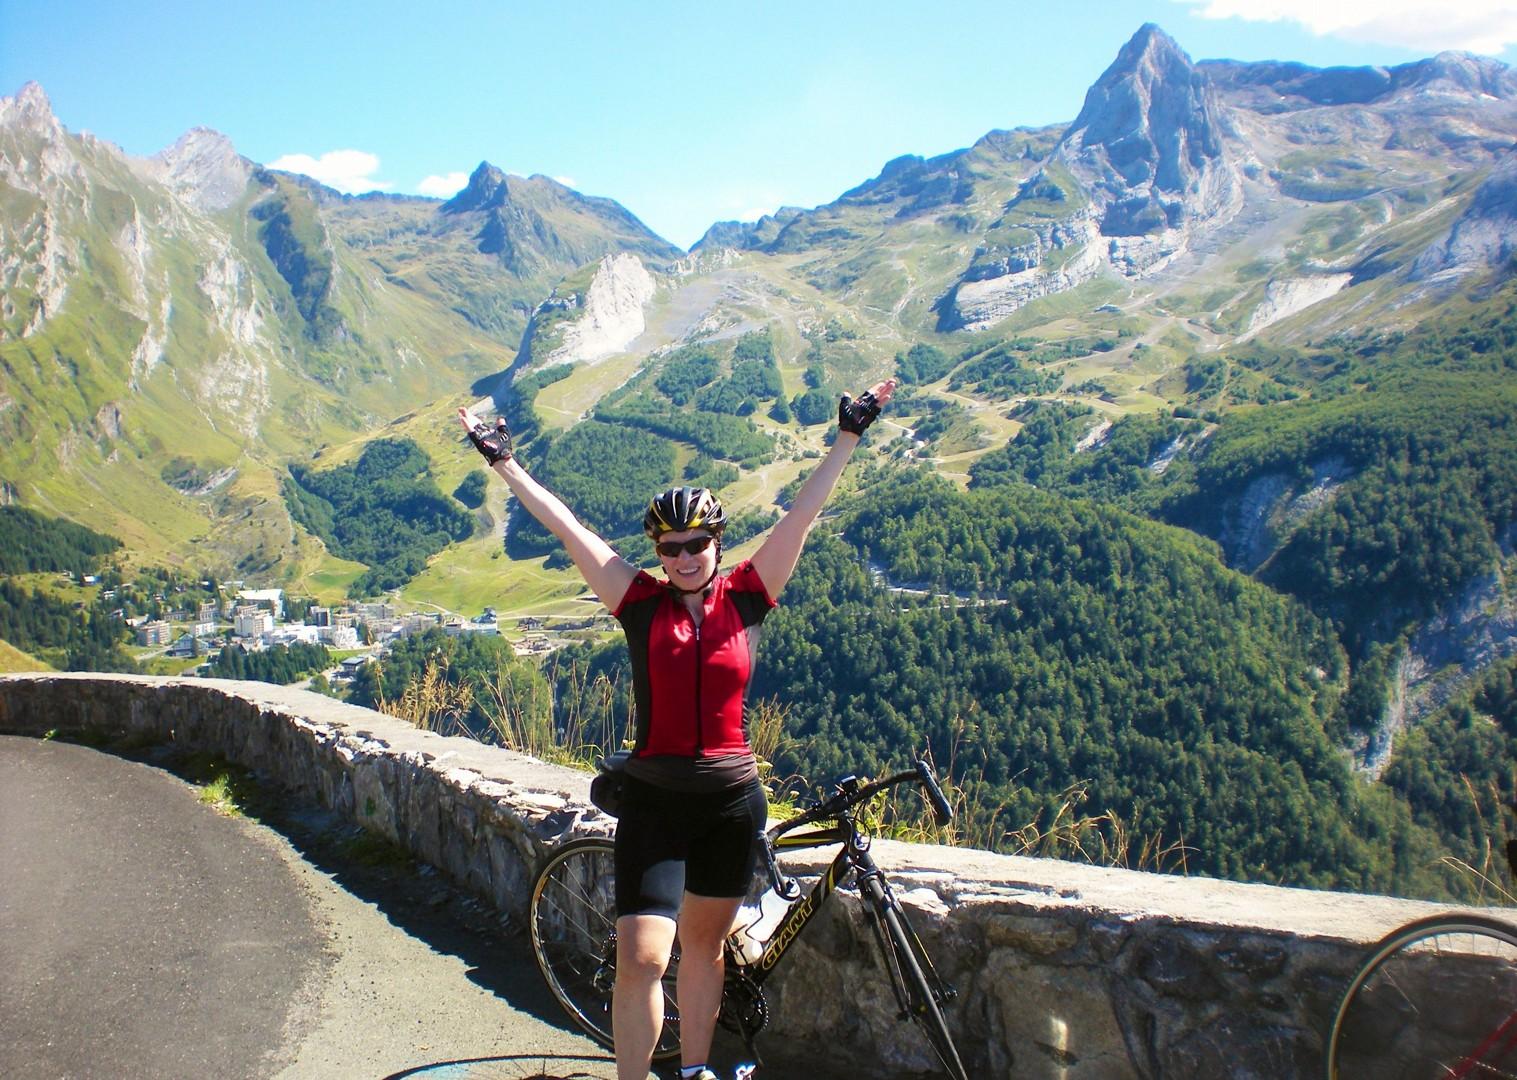 france-pyrenees-guided-road-cycling.jpg - France - Pyrenees Fitness Week - Guided Road Cycling Holiday (Grade 3-4) - Road Cycling